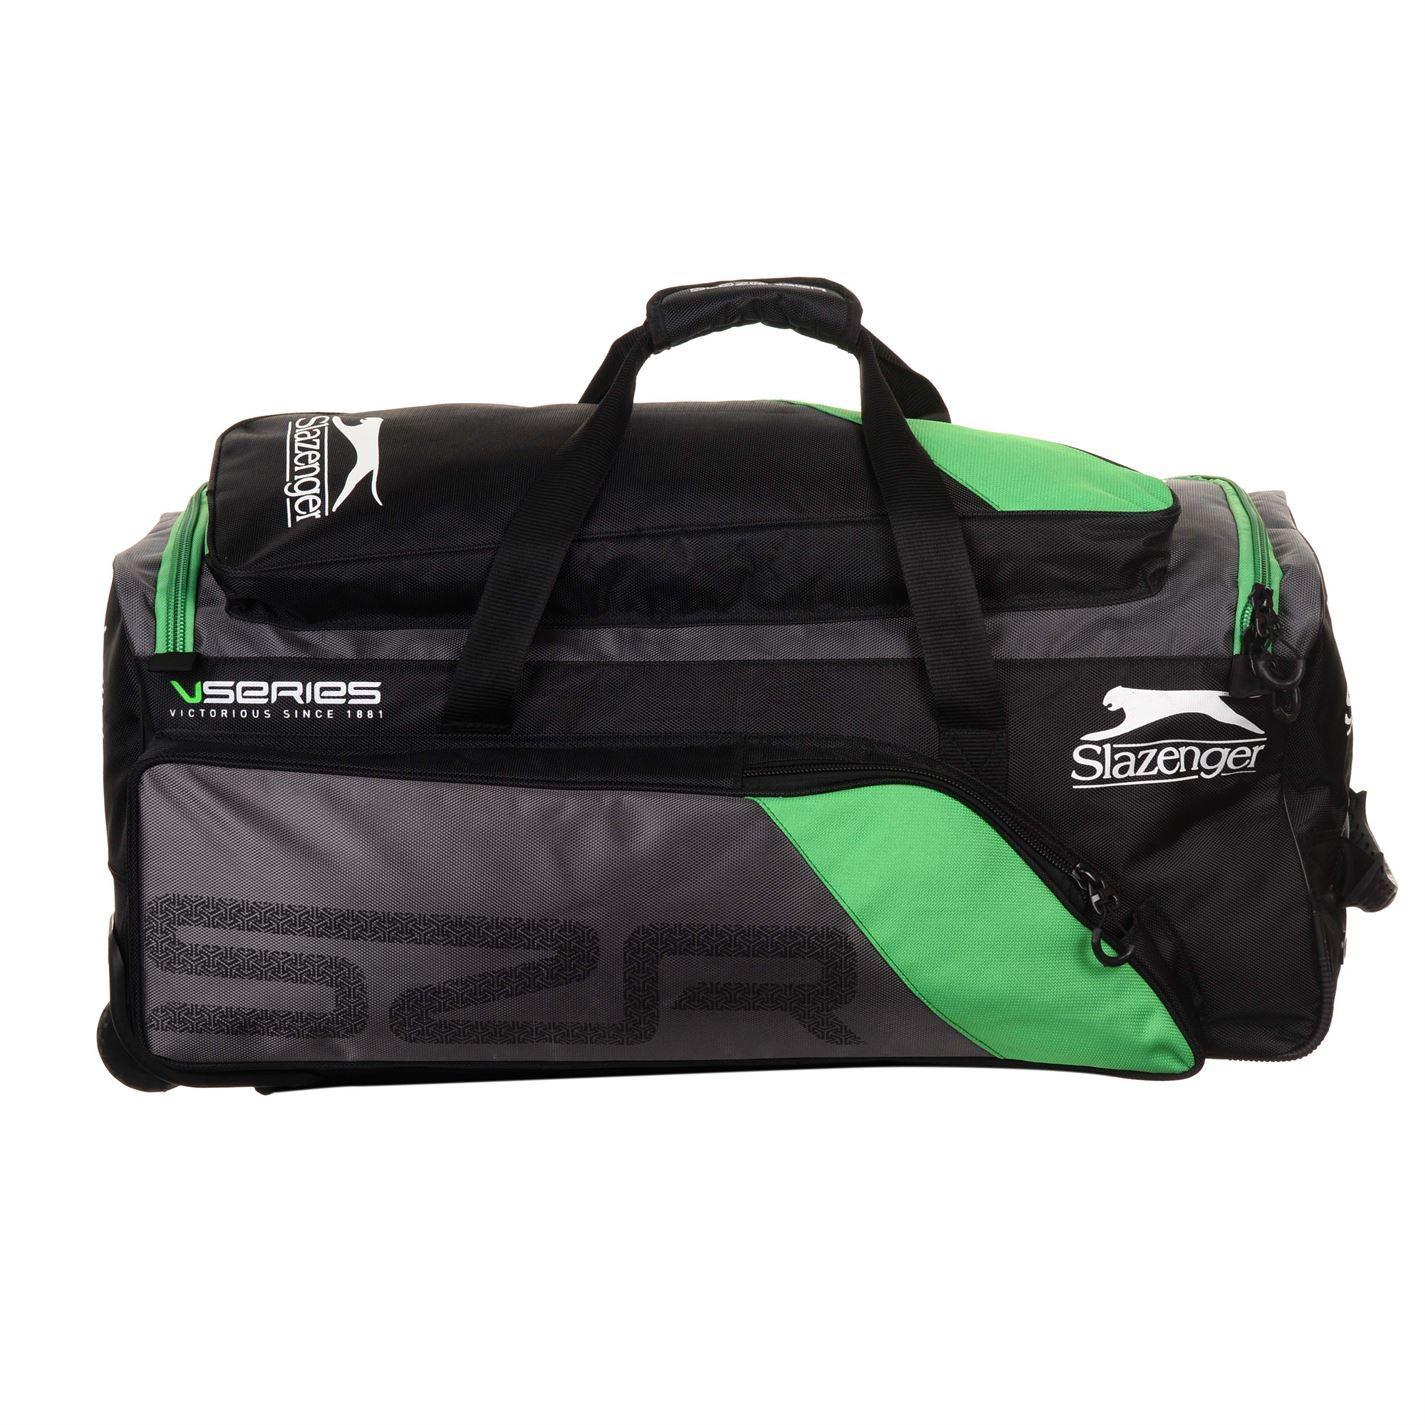 7d92d4fb99 ... Slazenger V-Series Pro Wheelie Cricket Bag Black/Green Bat & Pads  Holdall Case